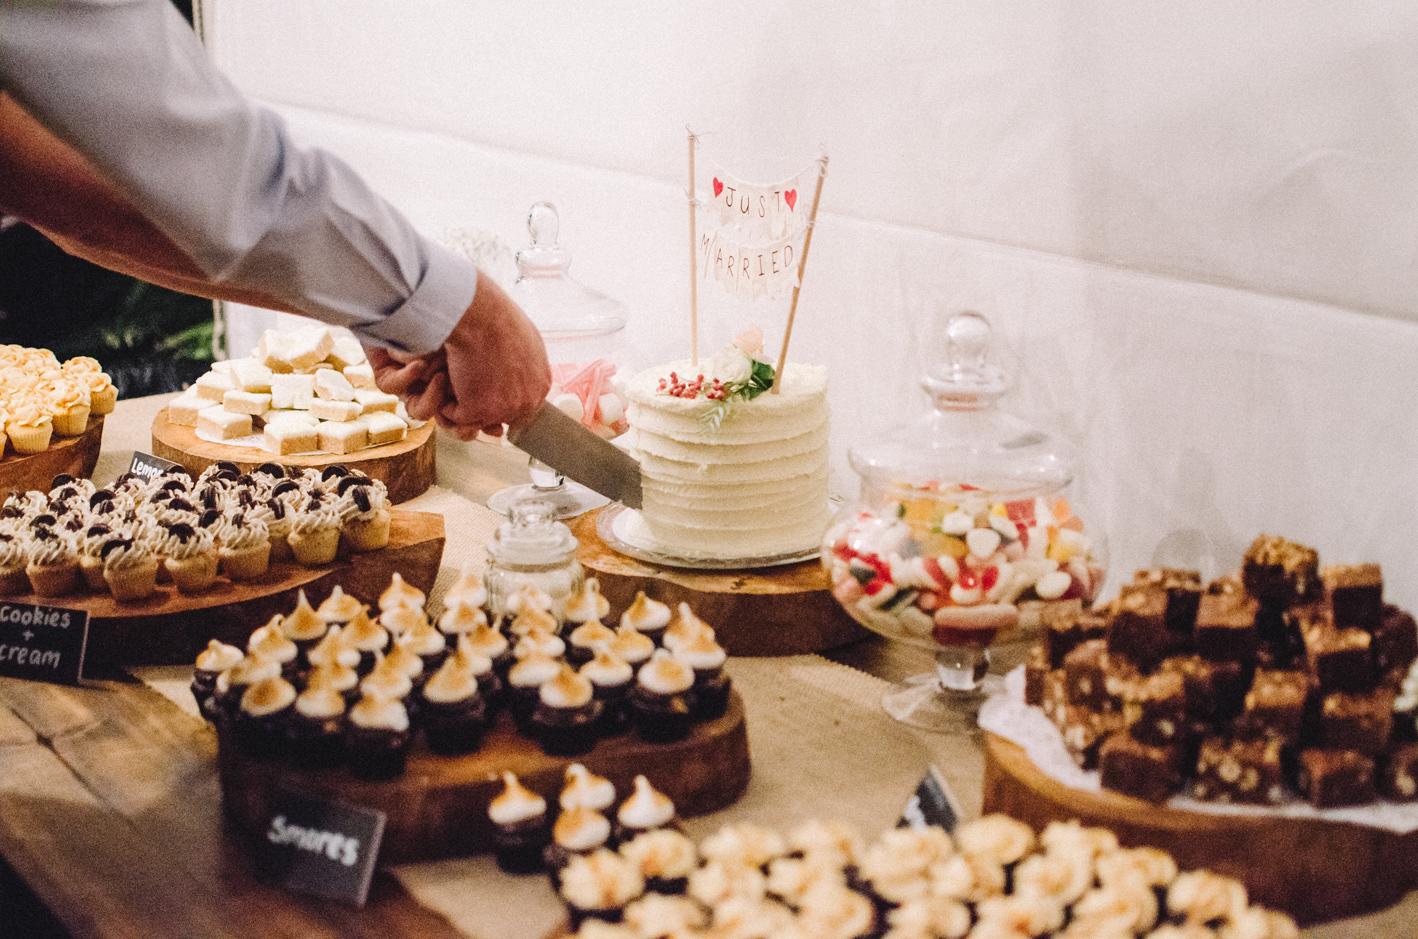 089-michelle-reagan-mount-tamborine-wedding-sophie-baker-photography